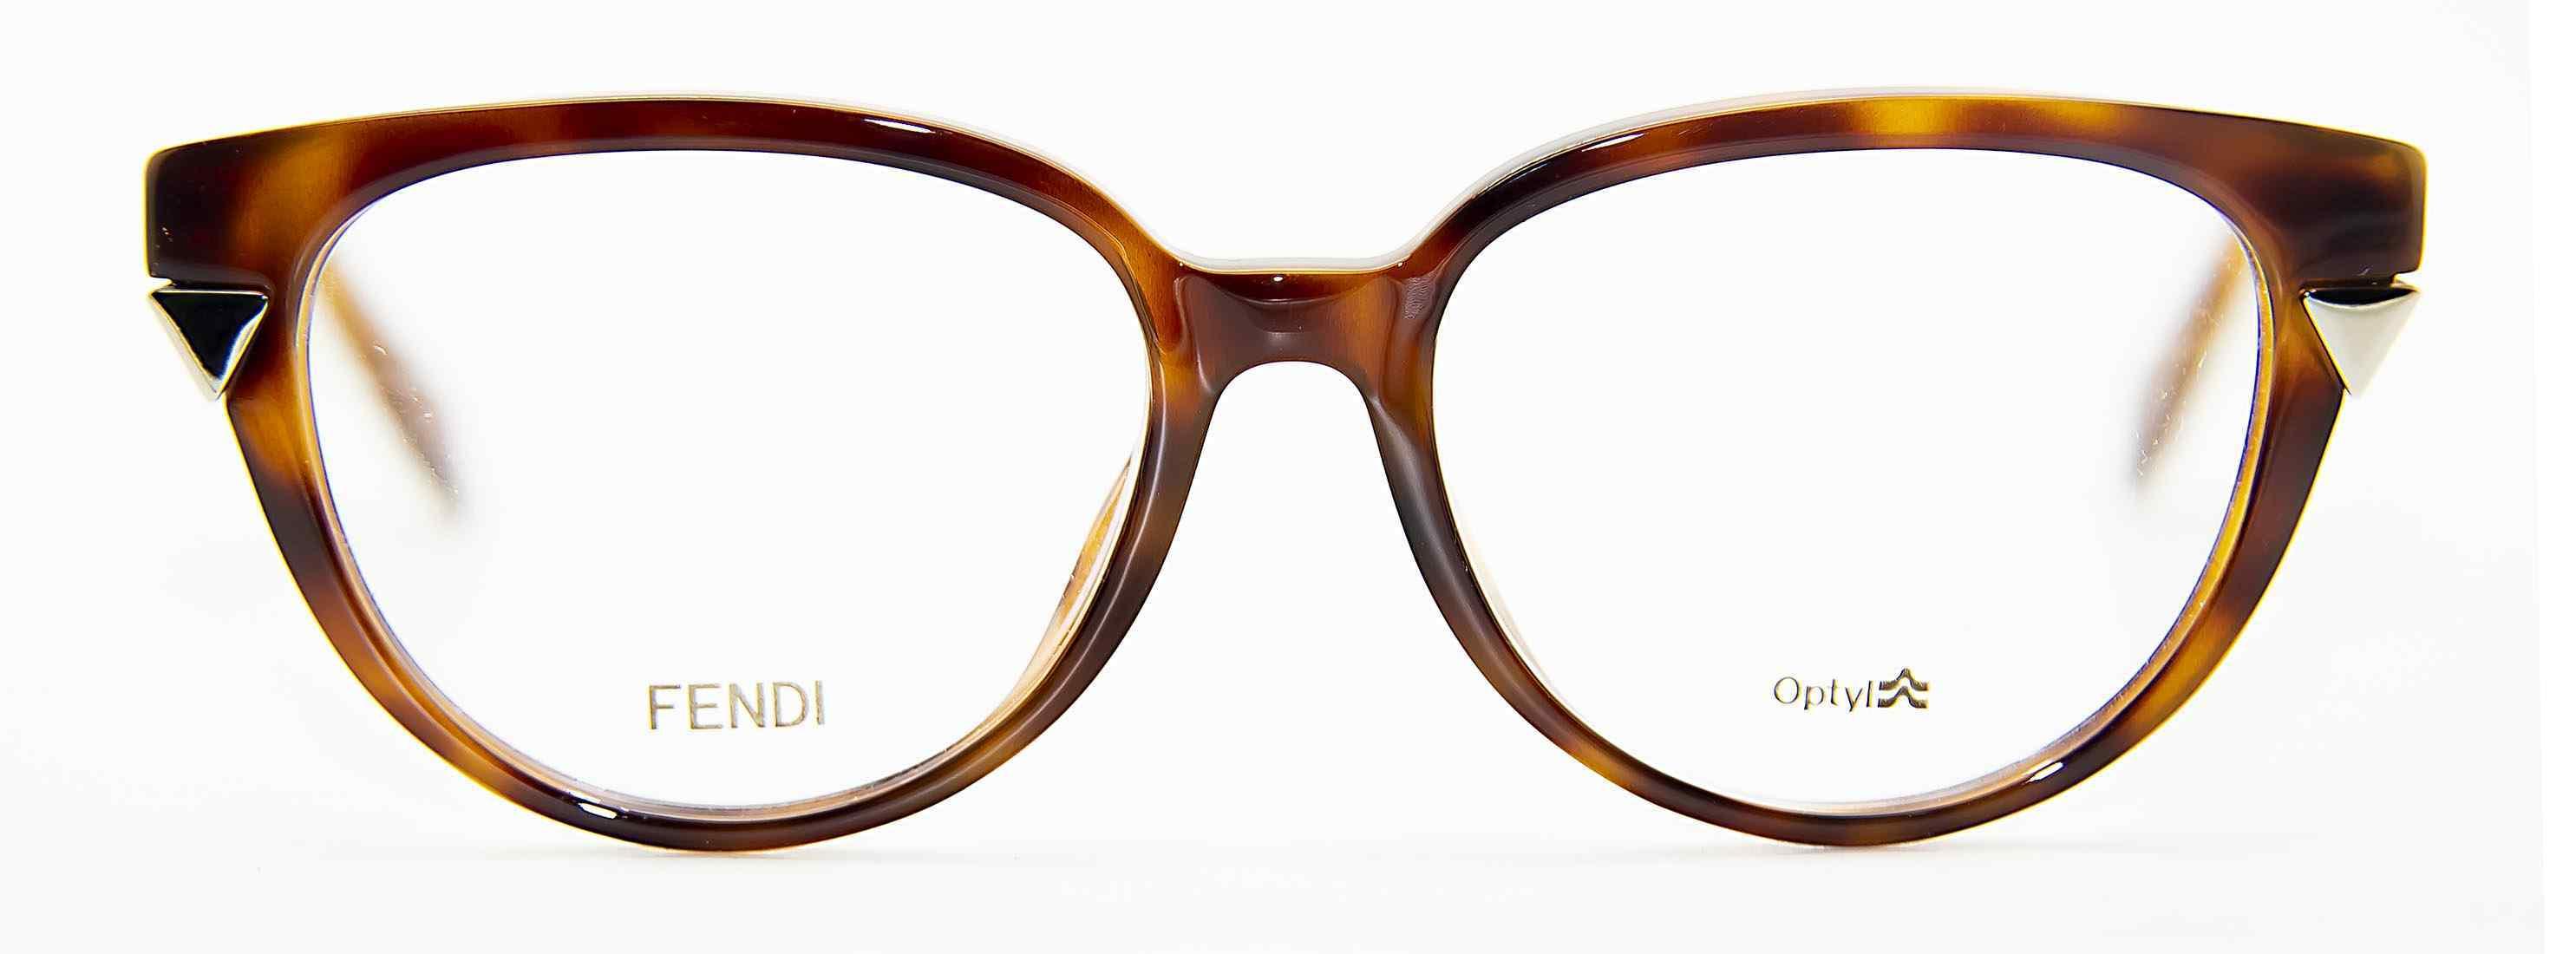 Fendi spectacles 0141 Mql 01 2970x1100